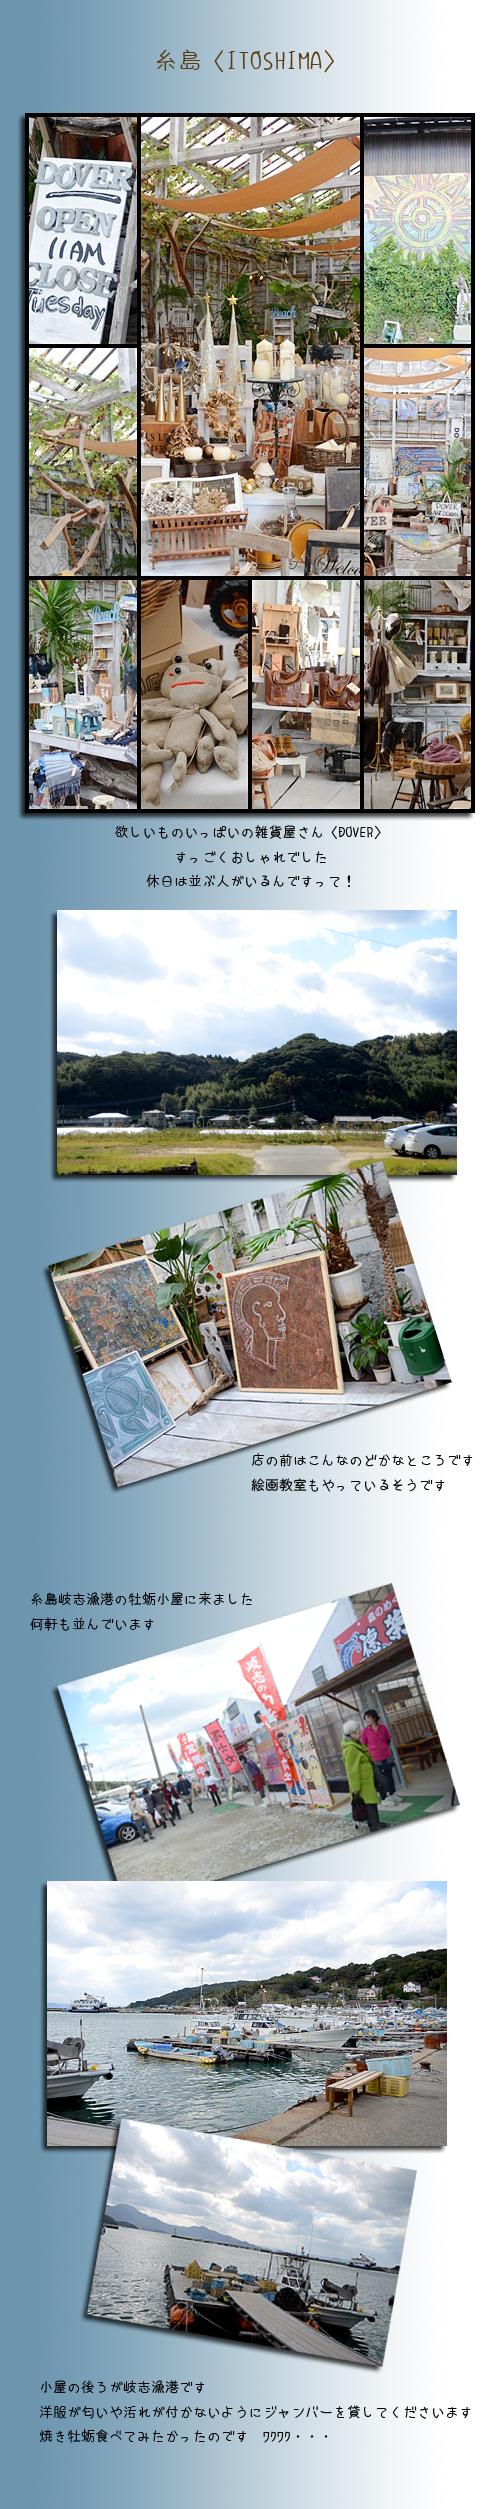 11月21日糸島1